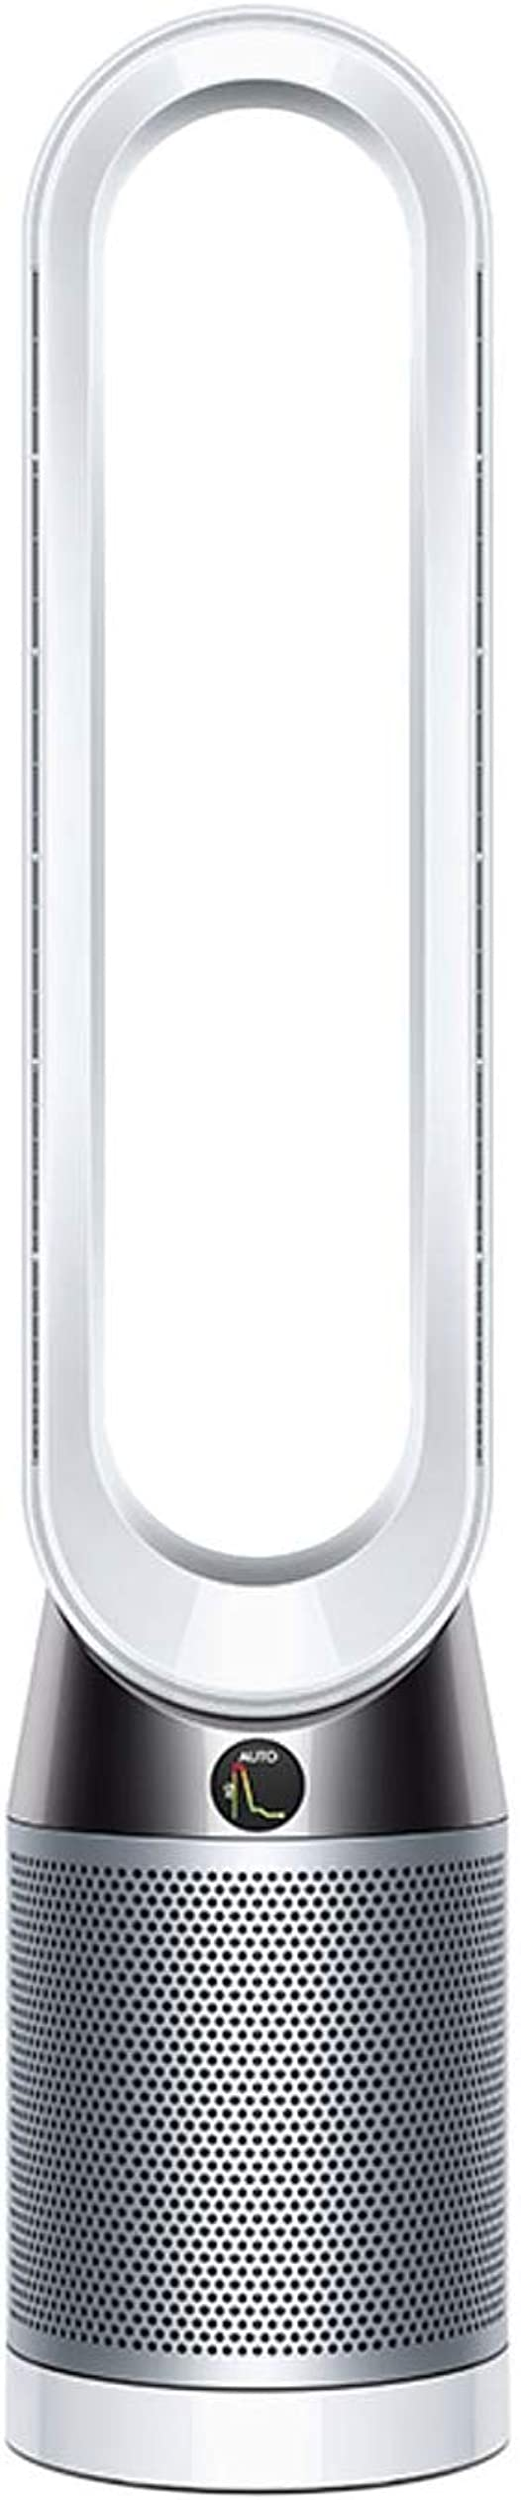 dyson purificatore-ventilatore a torre 310130-01